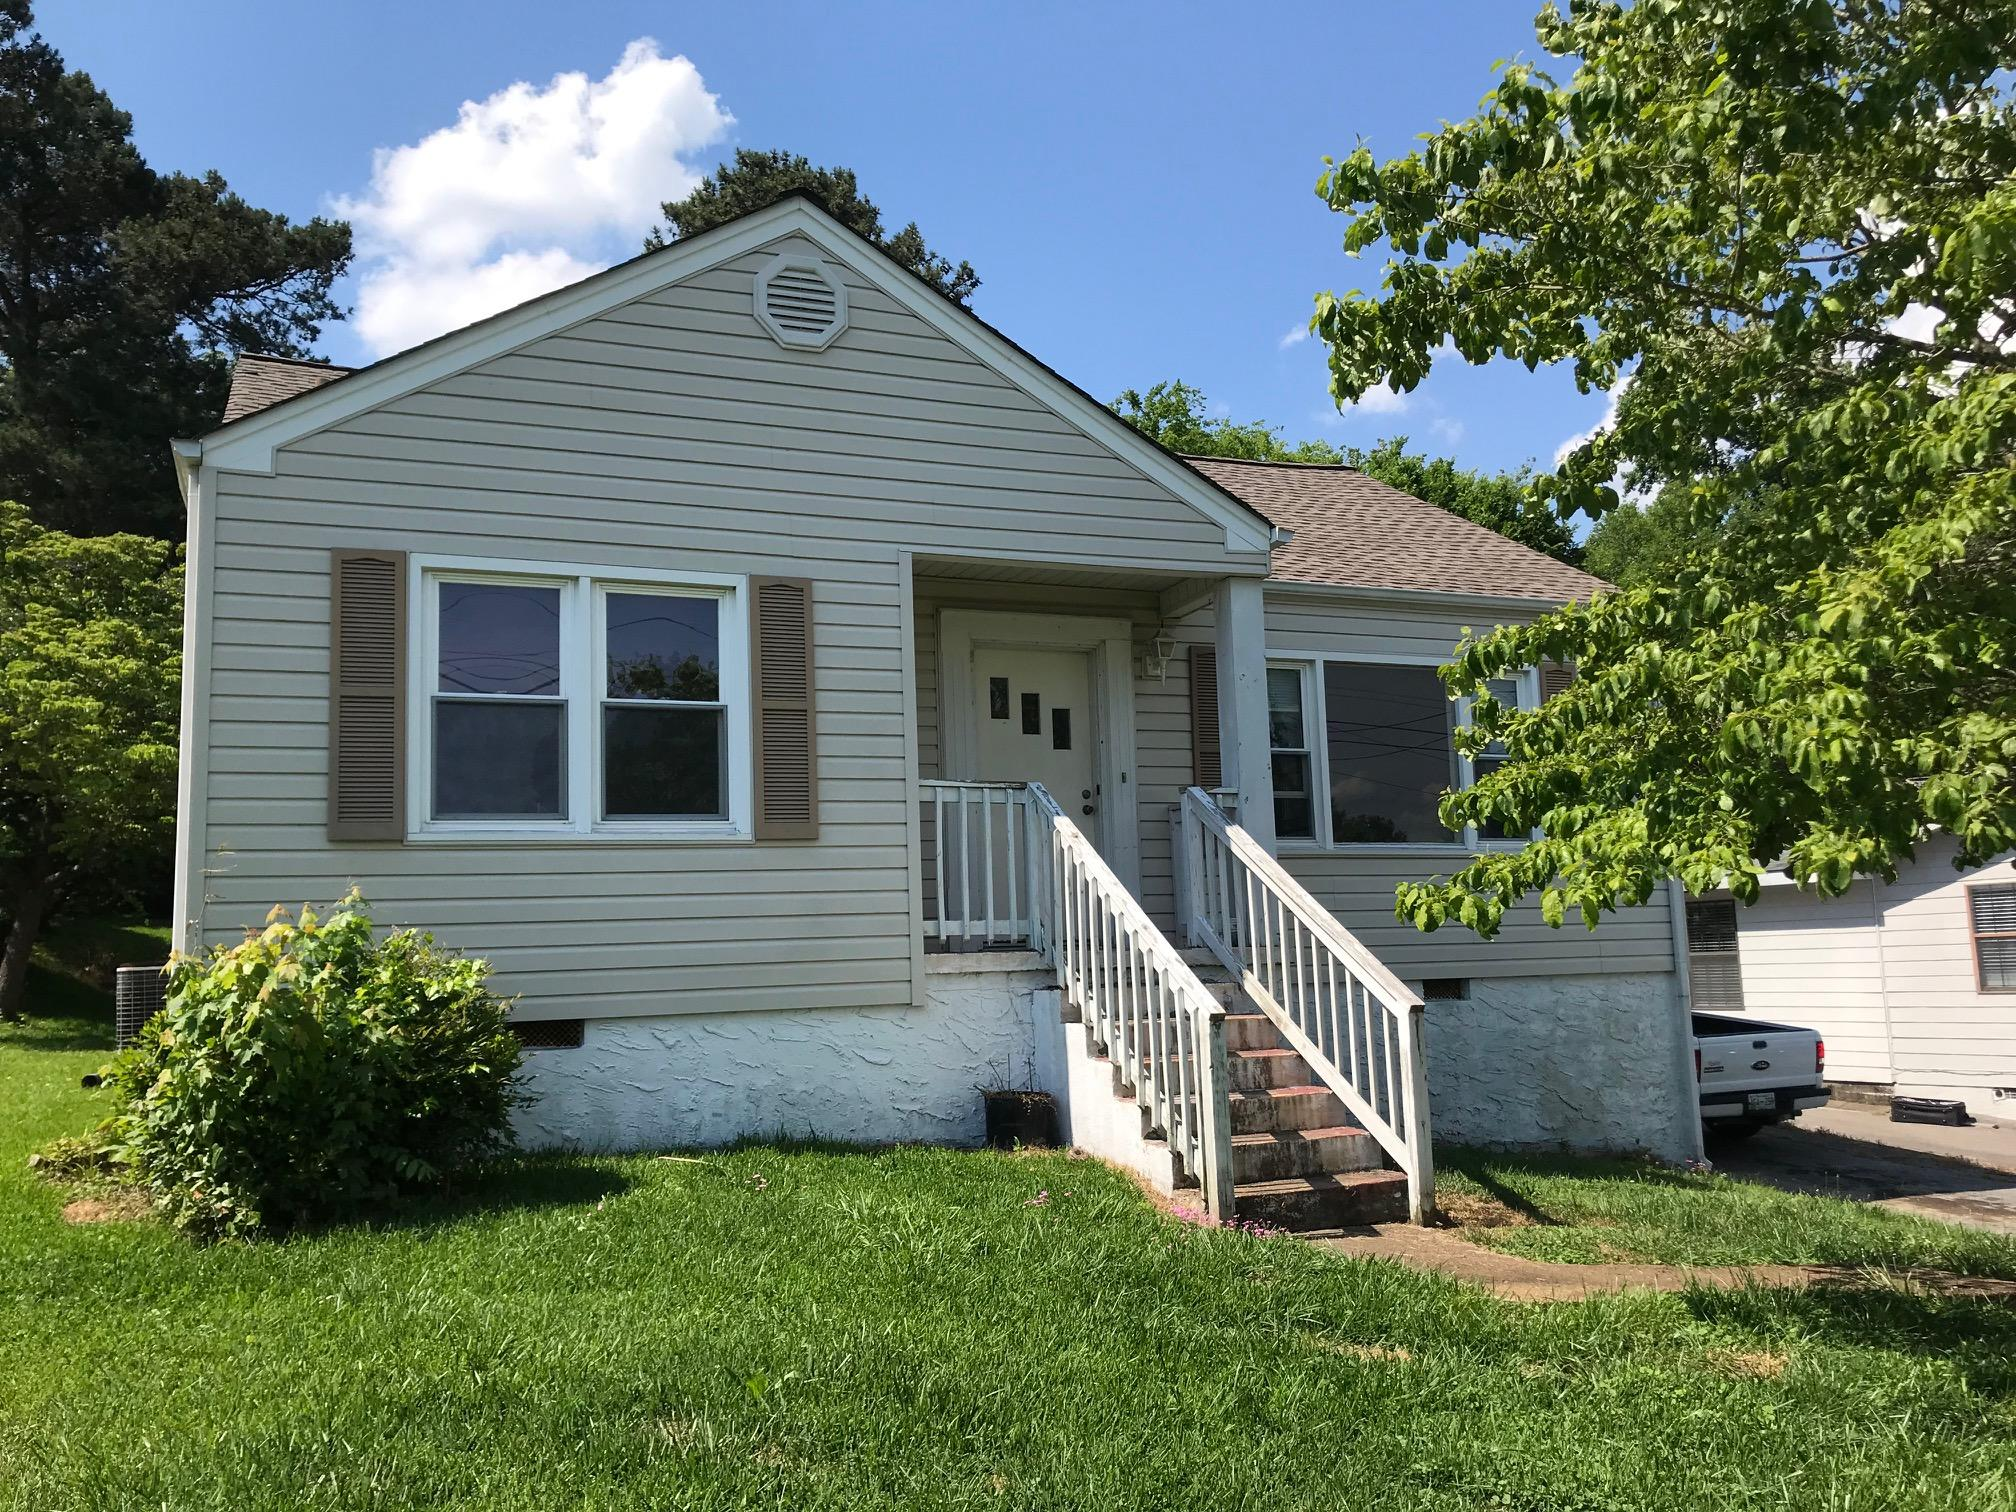 3421 Land St, Chattanooga, TN 37412